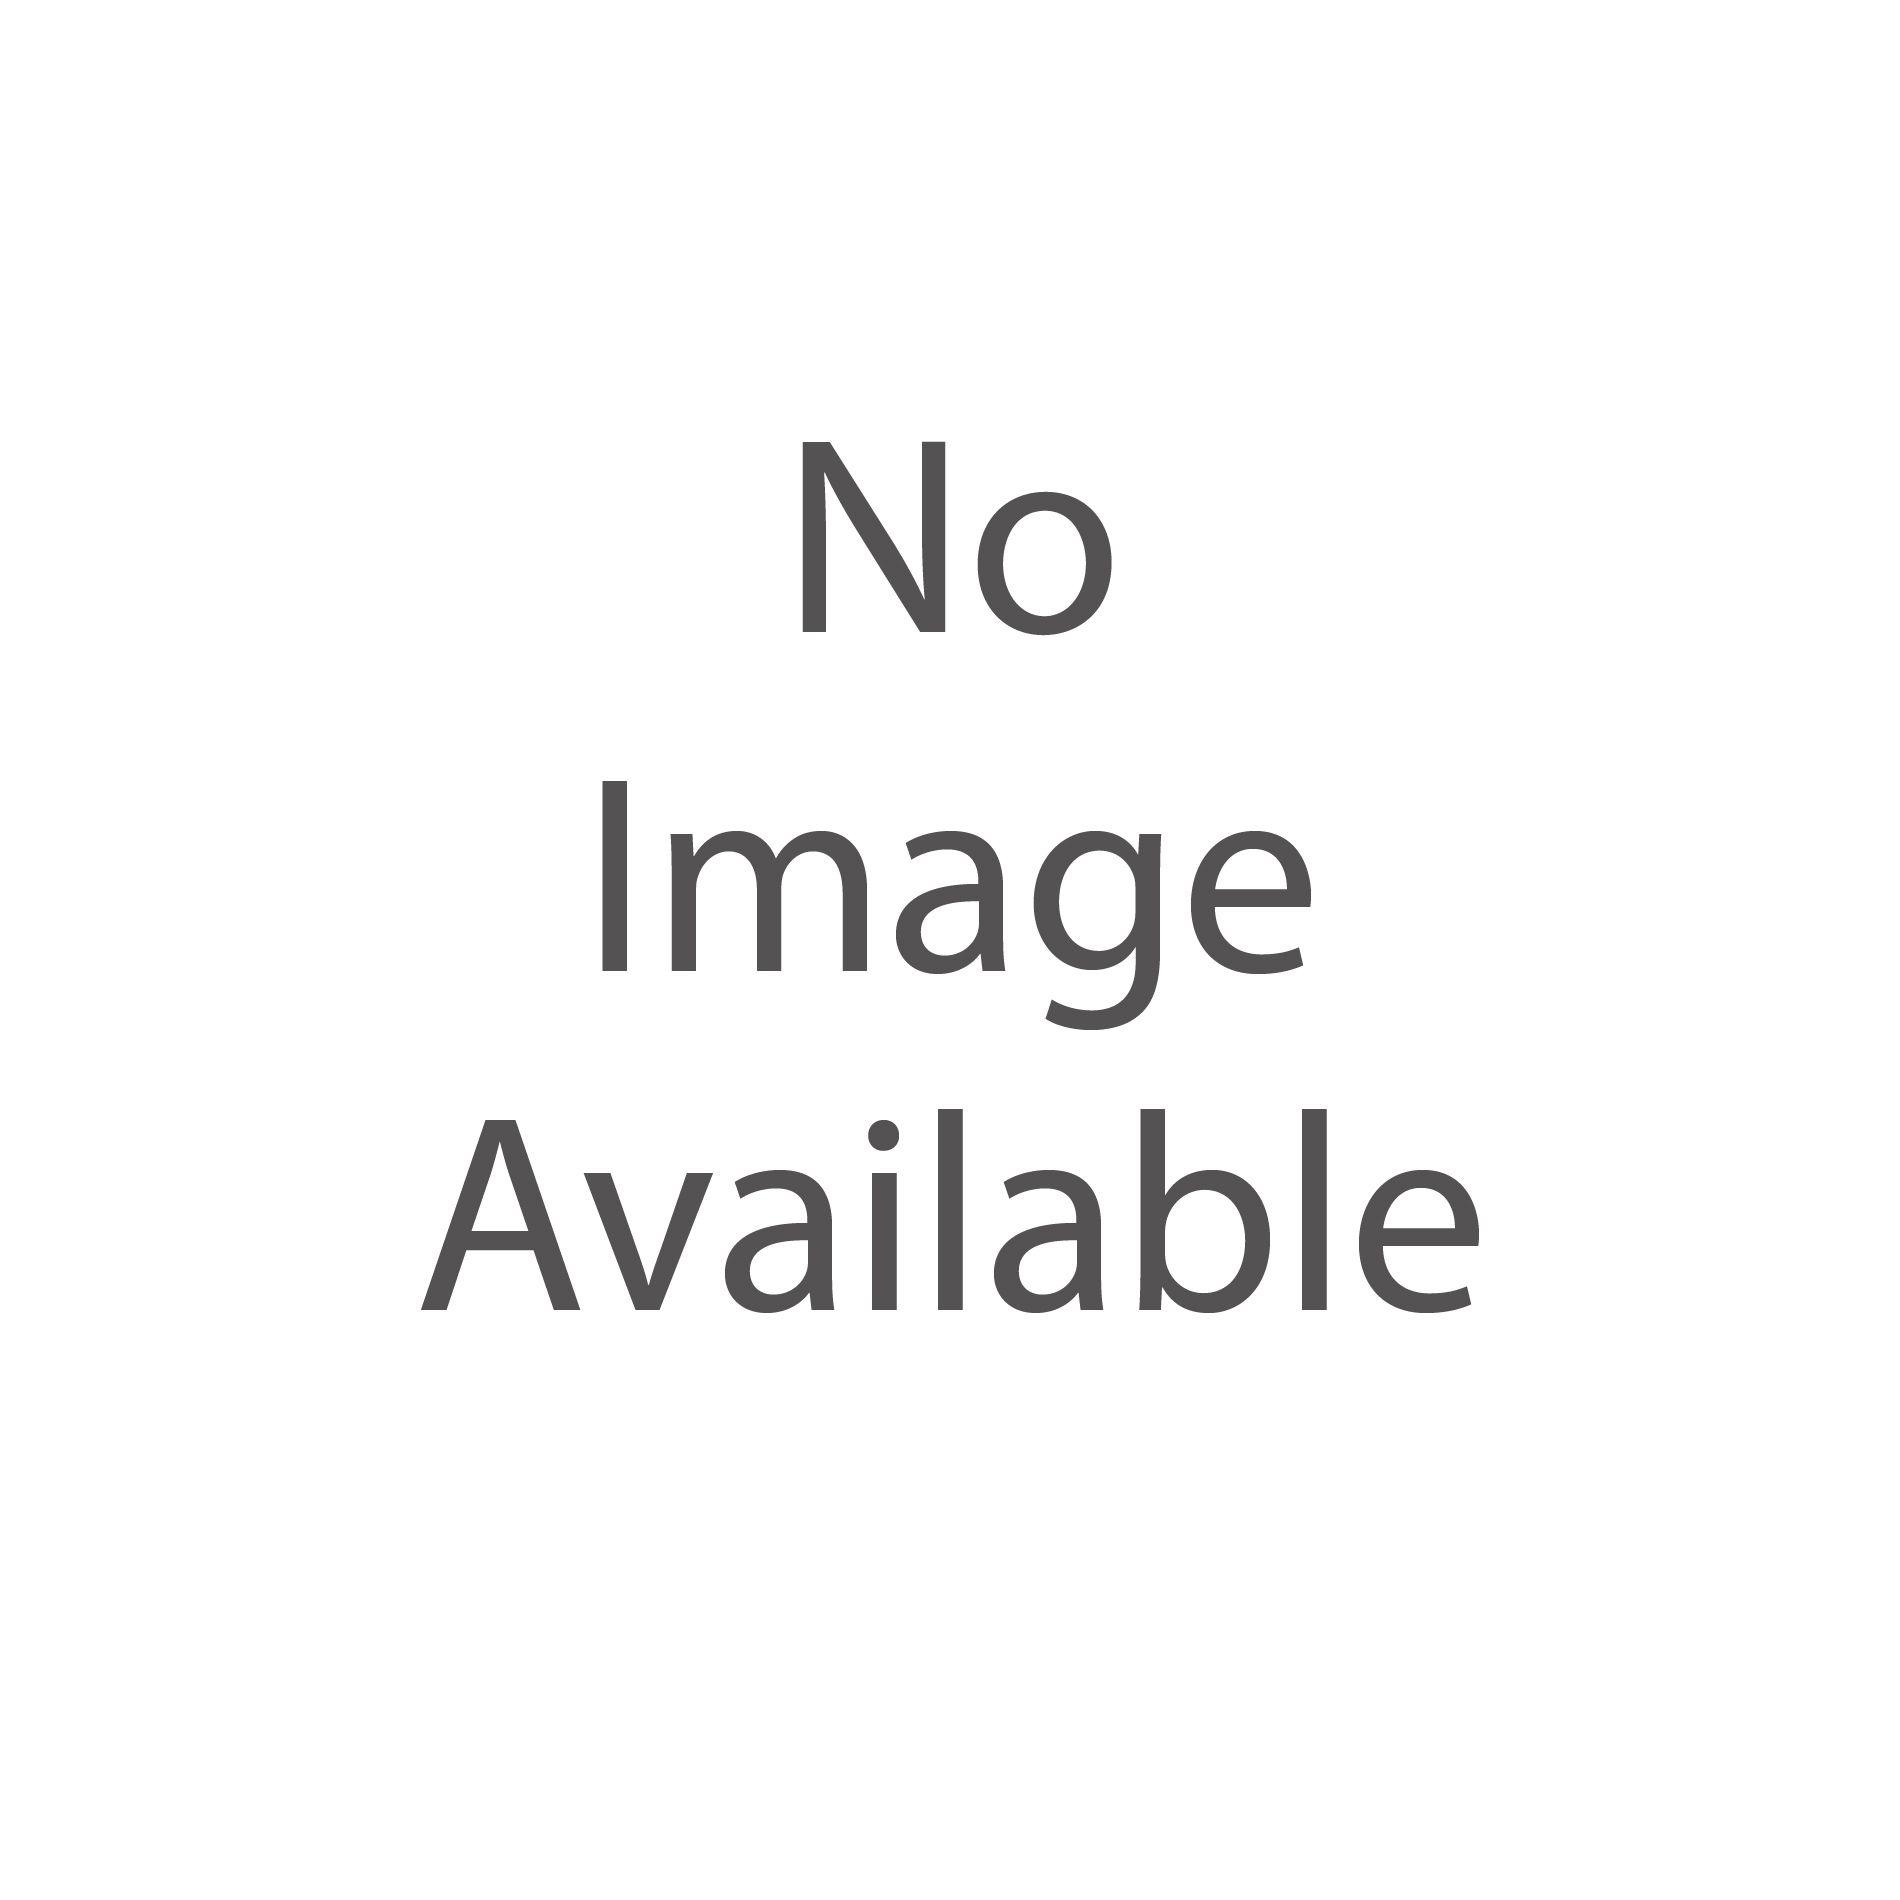 Conair Ponytailer Opal Butterfly & Flower PartNumber: 038W343522120001P KsnValue: 038W343522120001 MfgPartNumber: 34352212